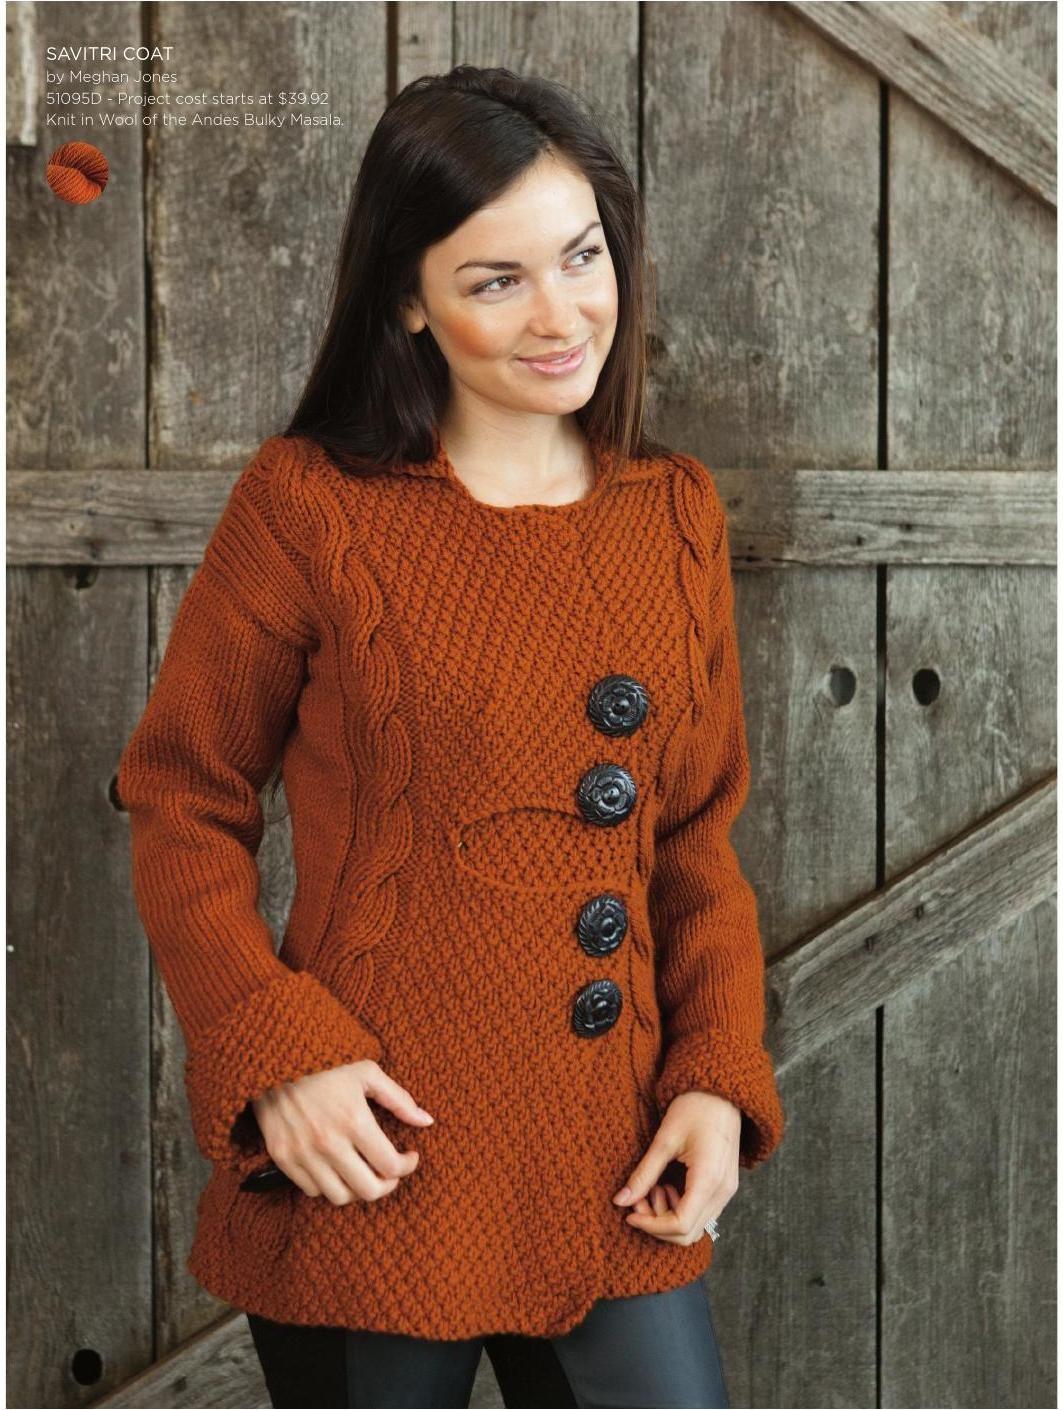 Knit Picks September 2013 Catalog Preview Coat patterns